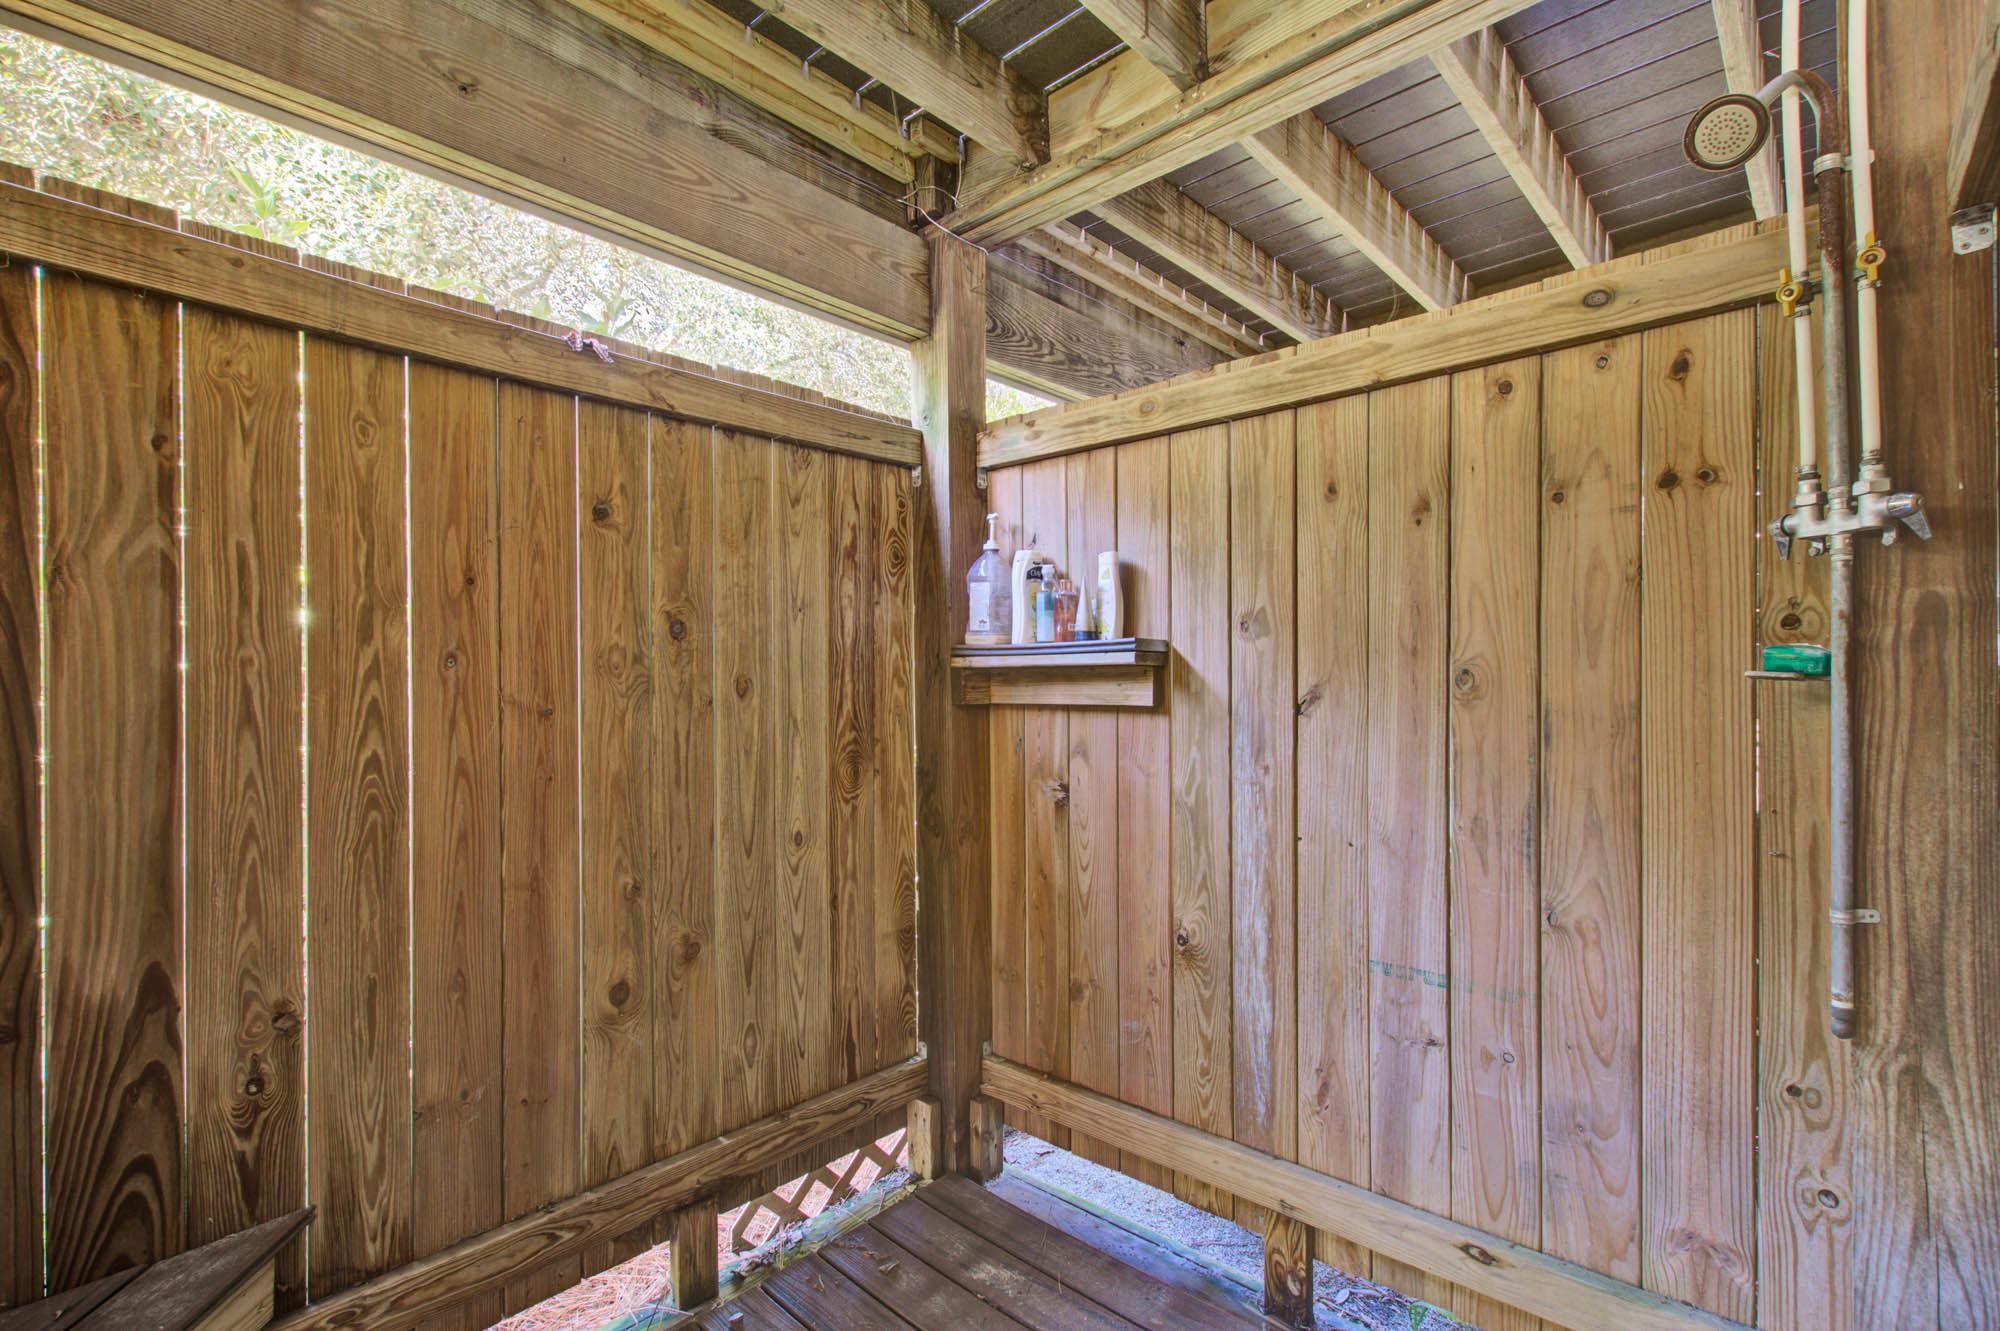 St Thomas Point Homes For Sale - 307 Jamesbury, Charleston, SC - 11